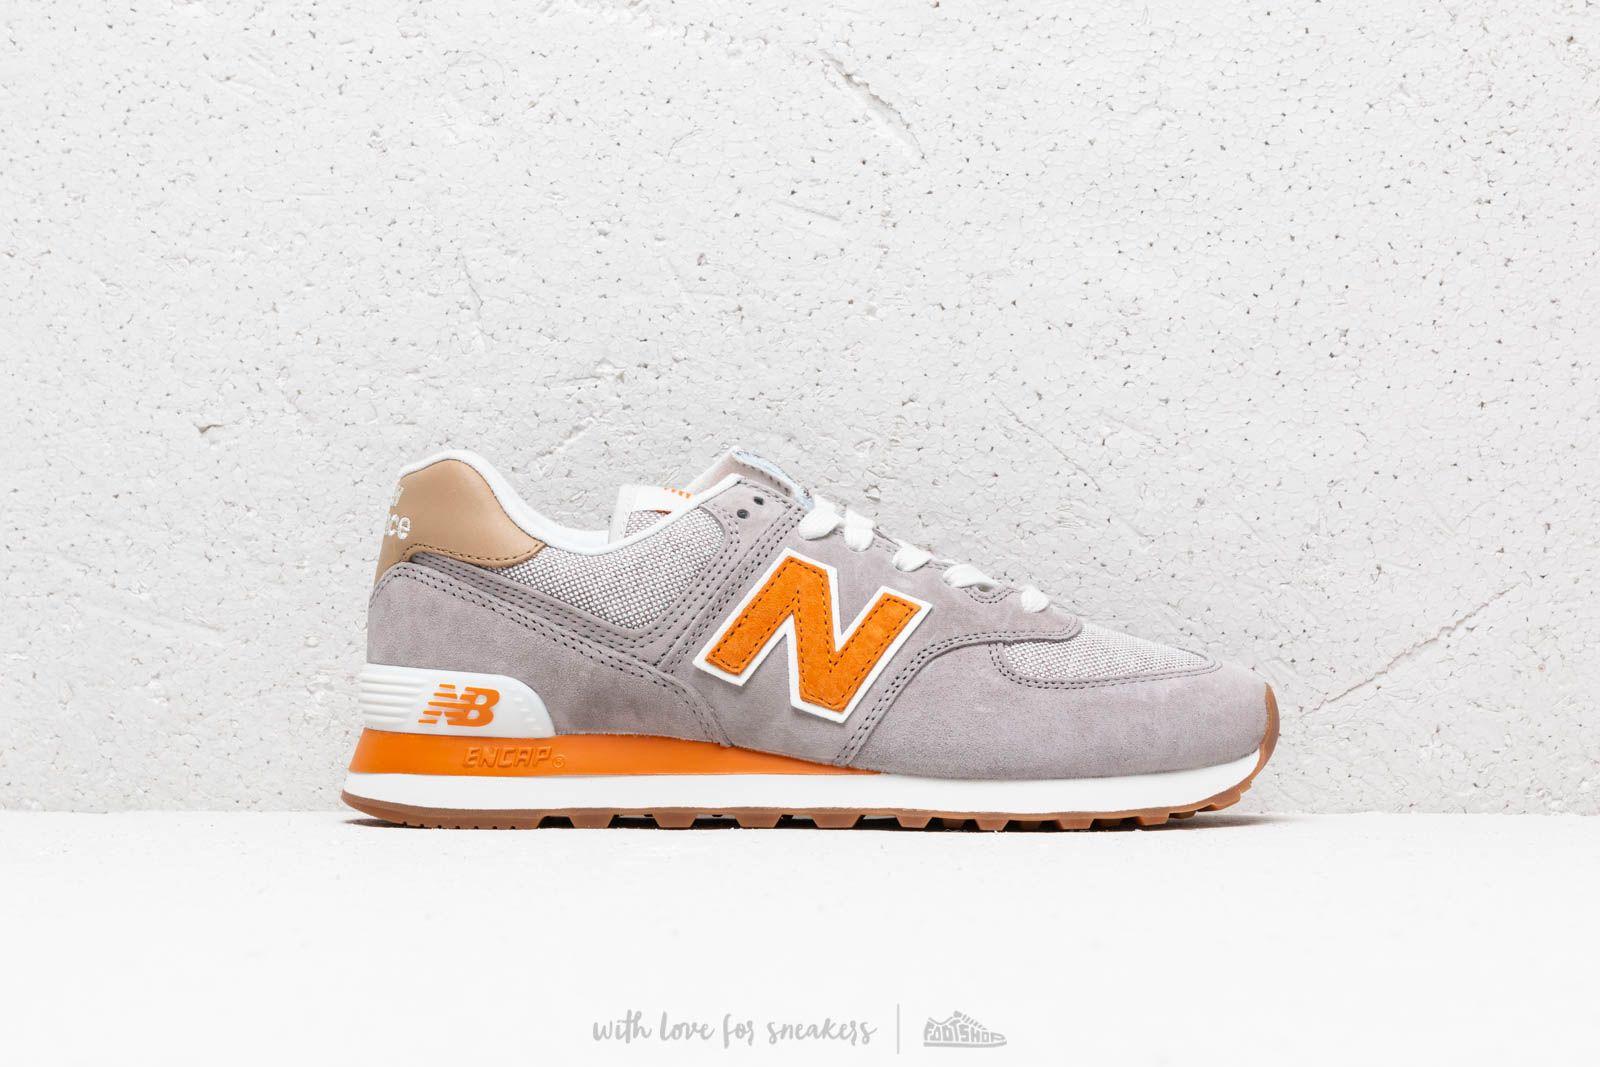 new balance 574 grey orange